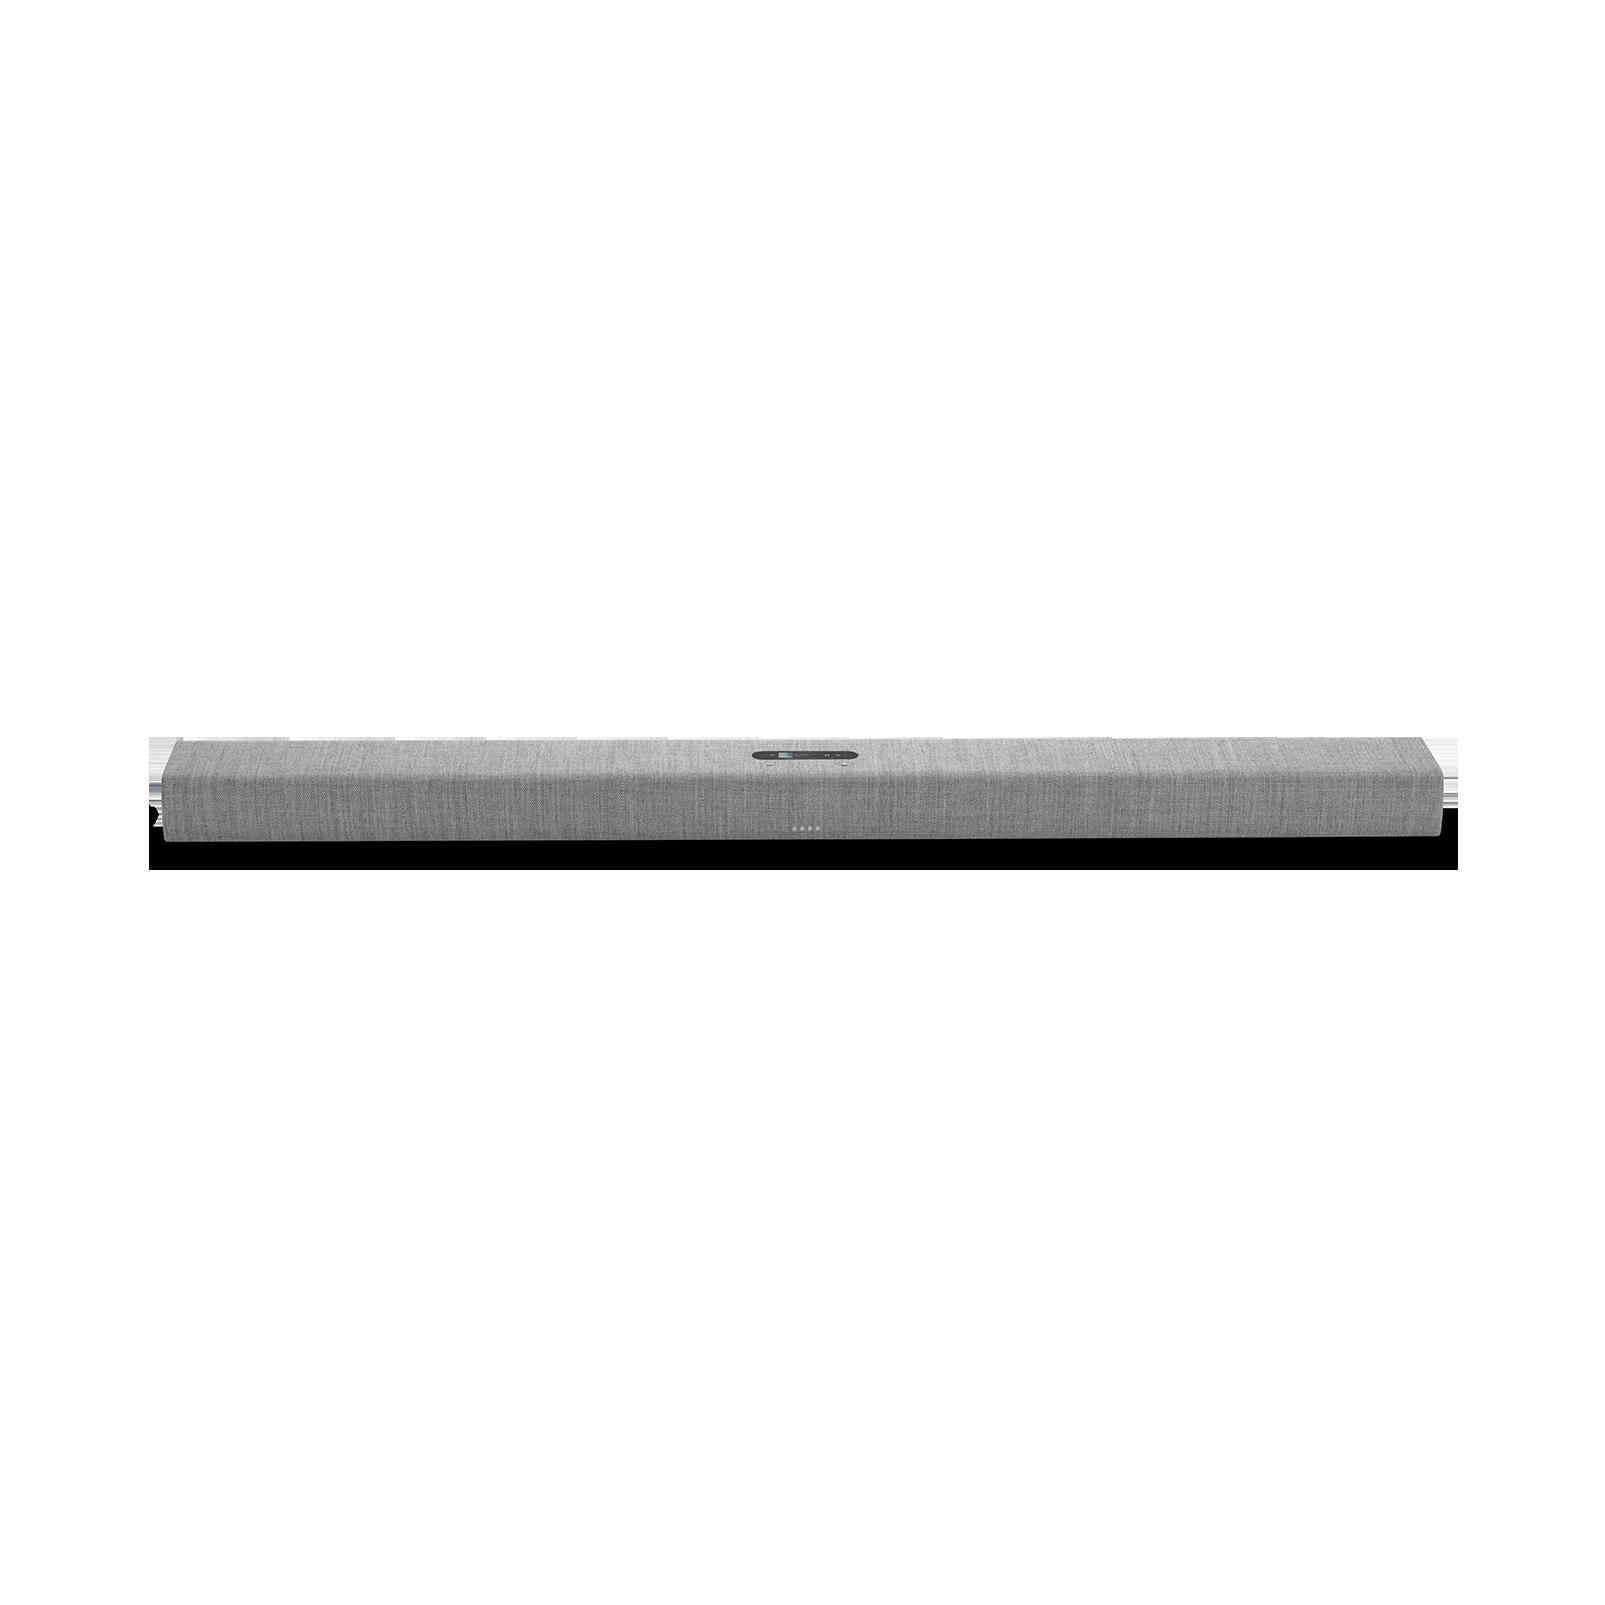 Harman Kardon Citation Bar - Grey - The smartest soundbar for movies and music - Front